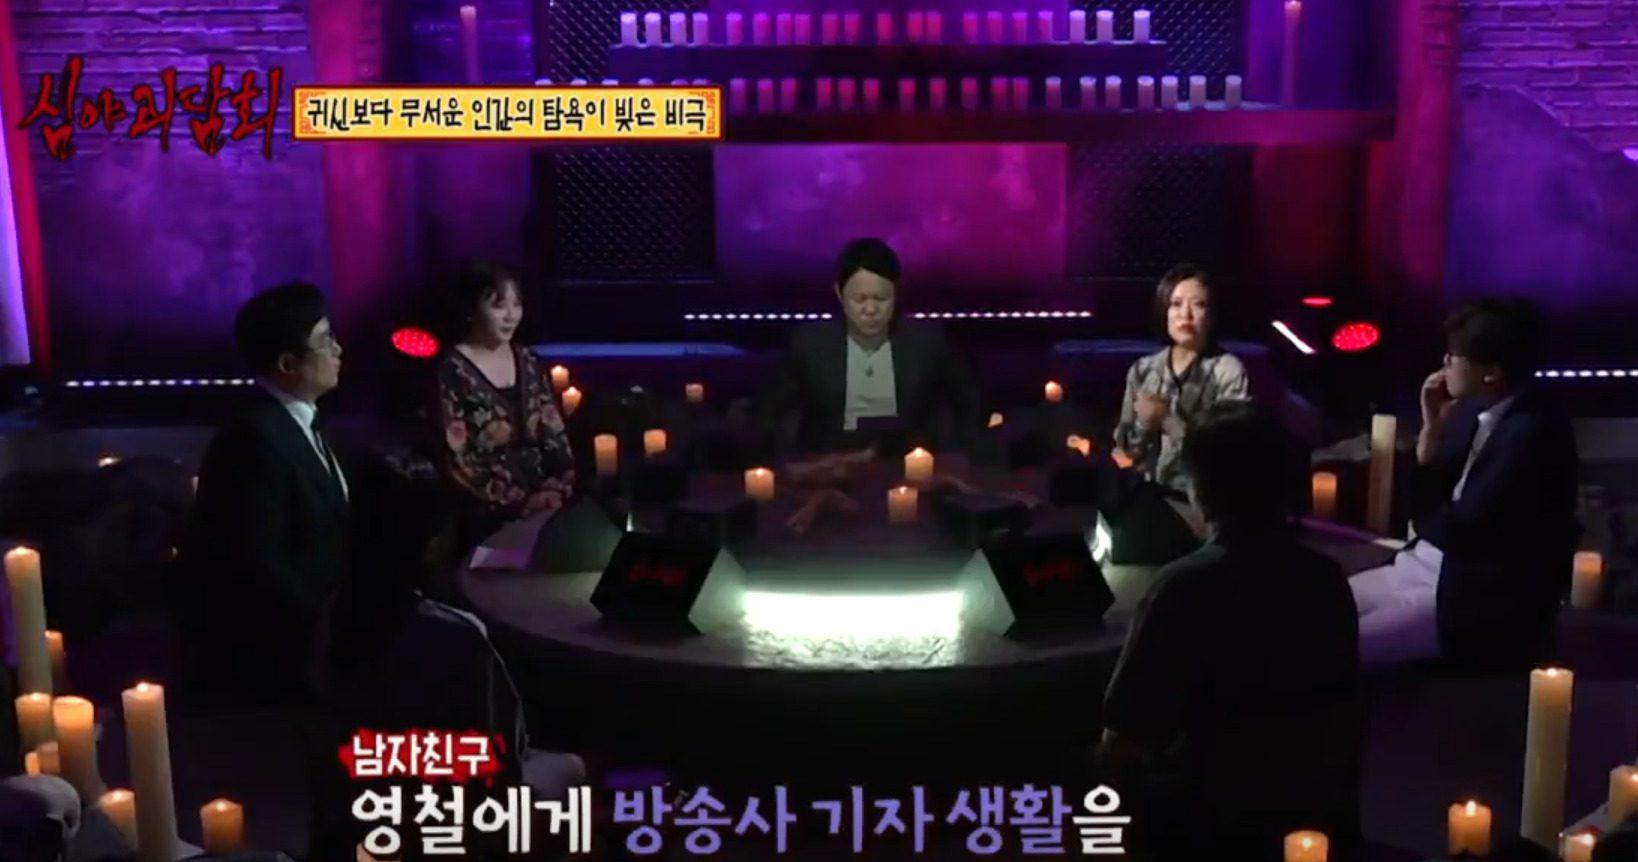 Late Night Ghost Talk episode 25